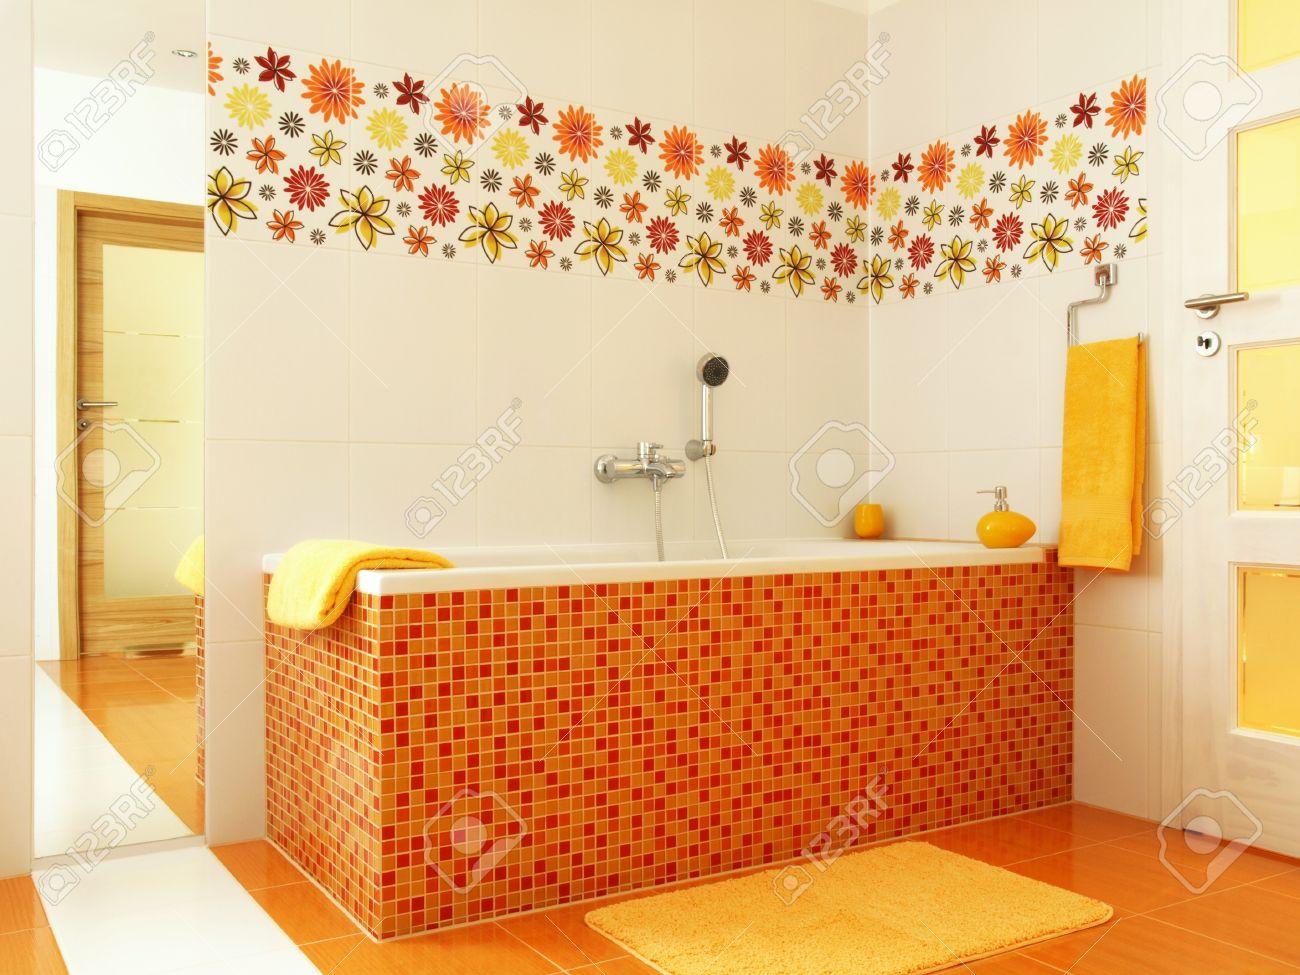 Colorful bathroom decoration - Colorful Bathroom With Orange Mosaic Bathtub And Yellow Towels Stock Photo 13058289